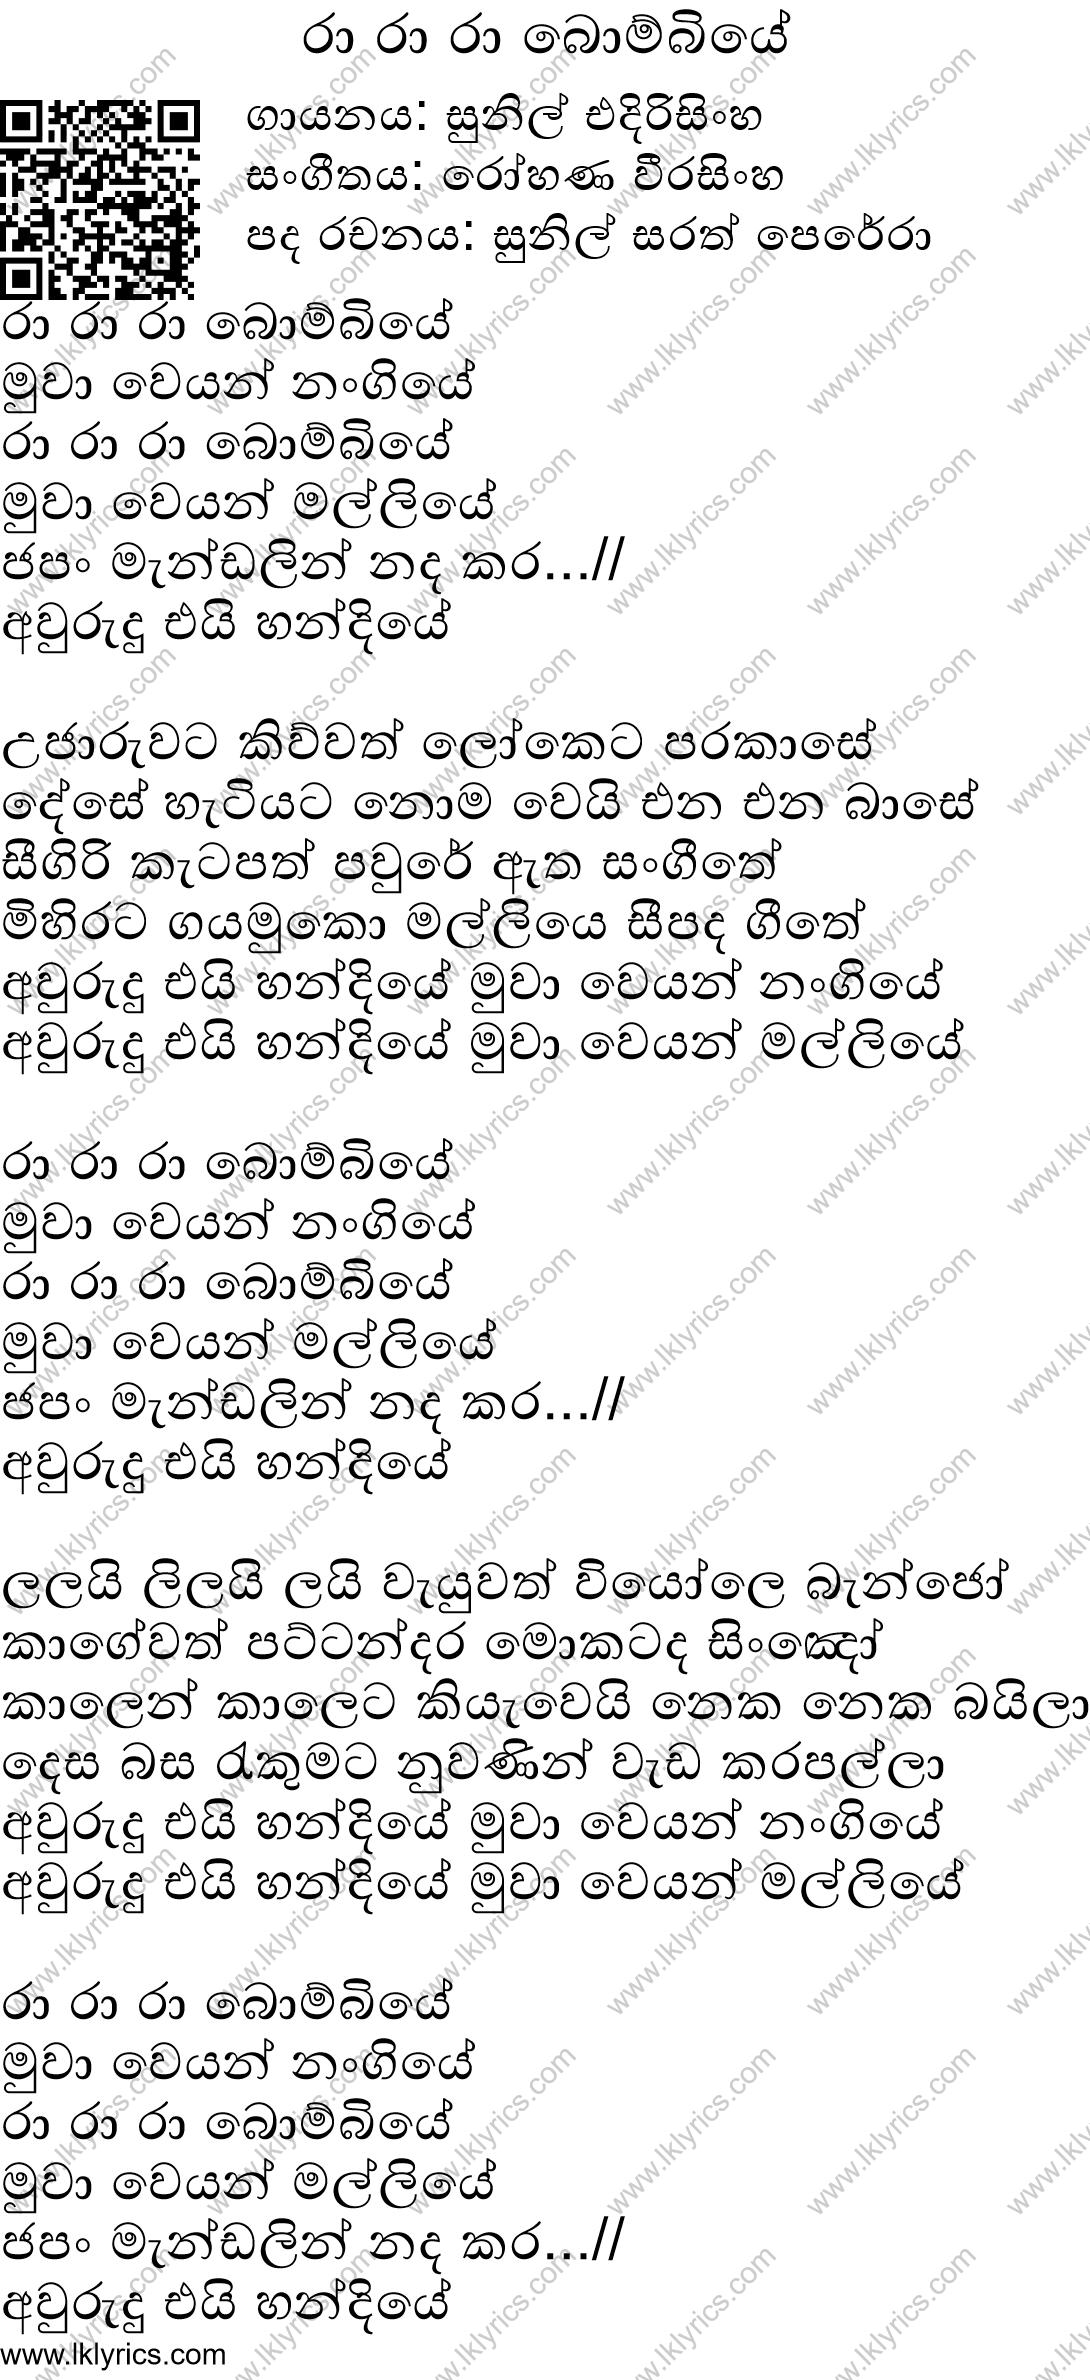 pana mada kadithi mp3 song